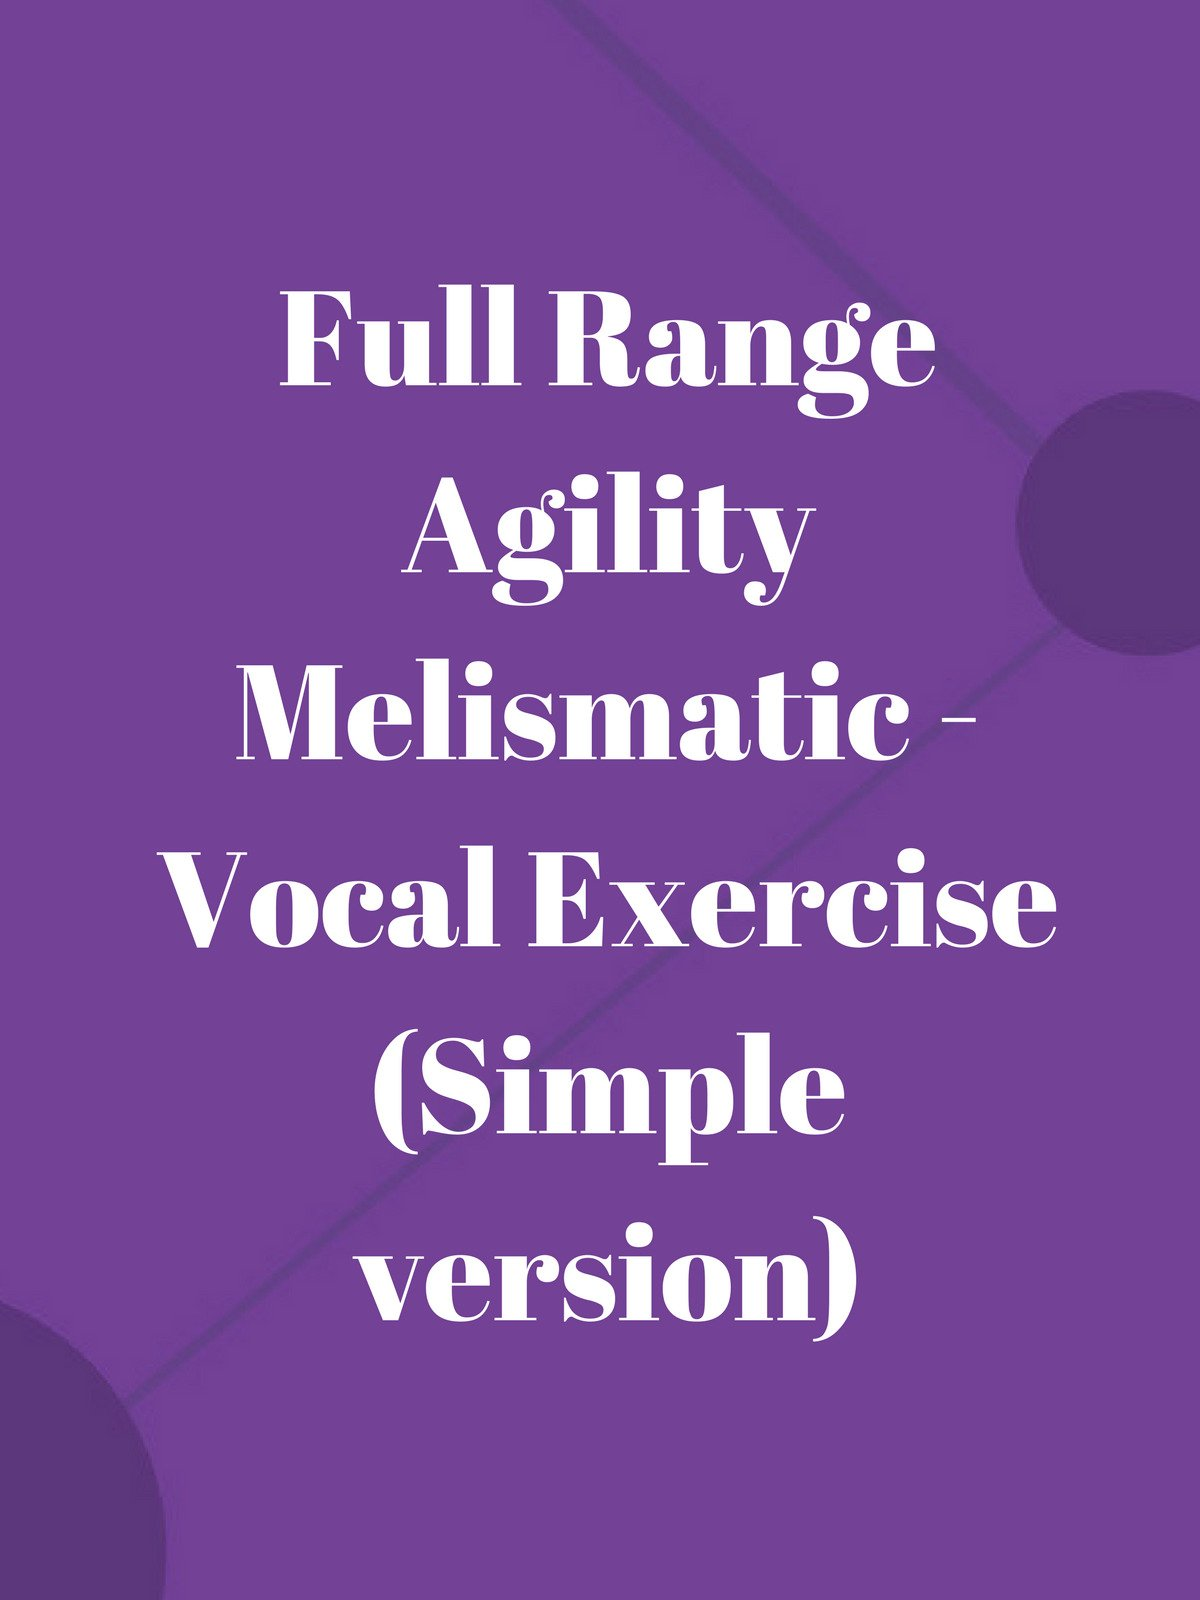 Full Range Agility Melismatic